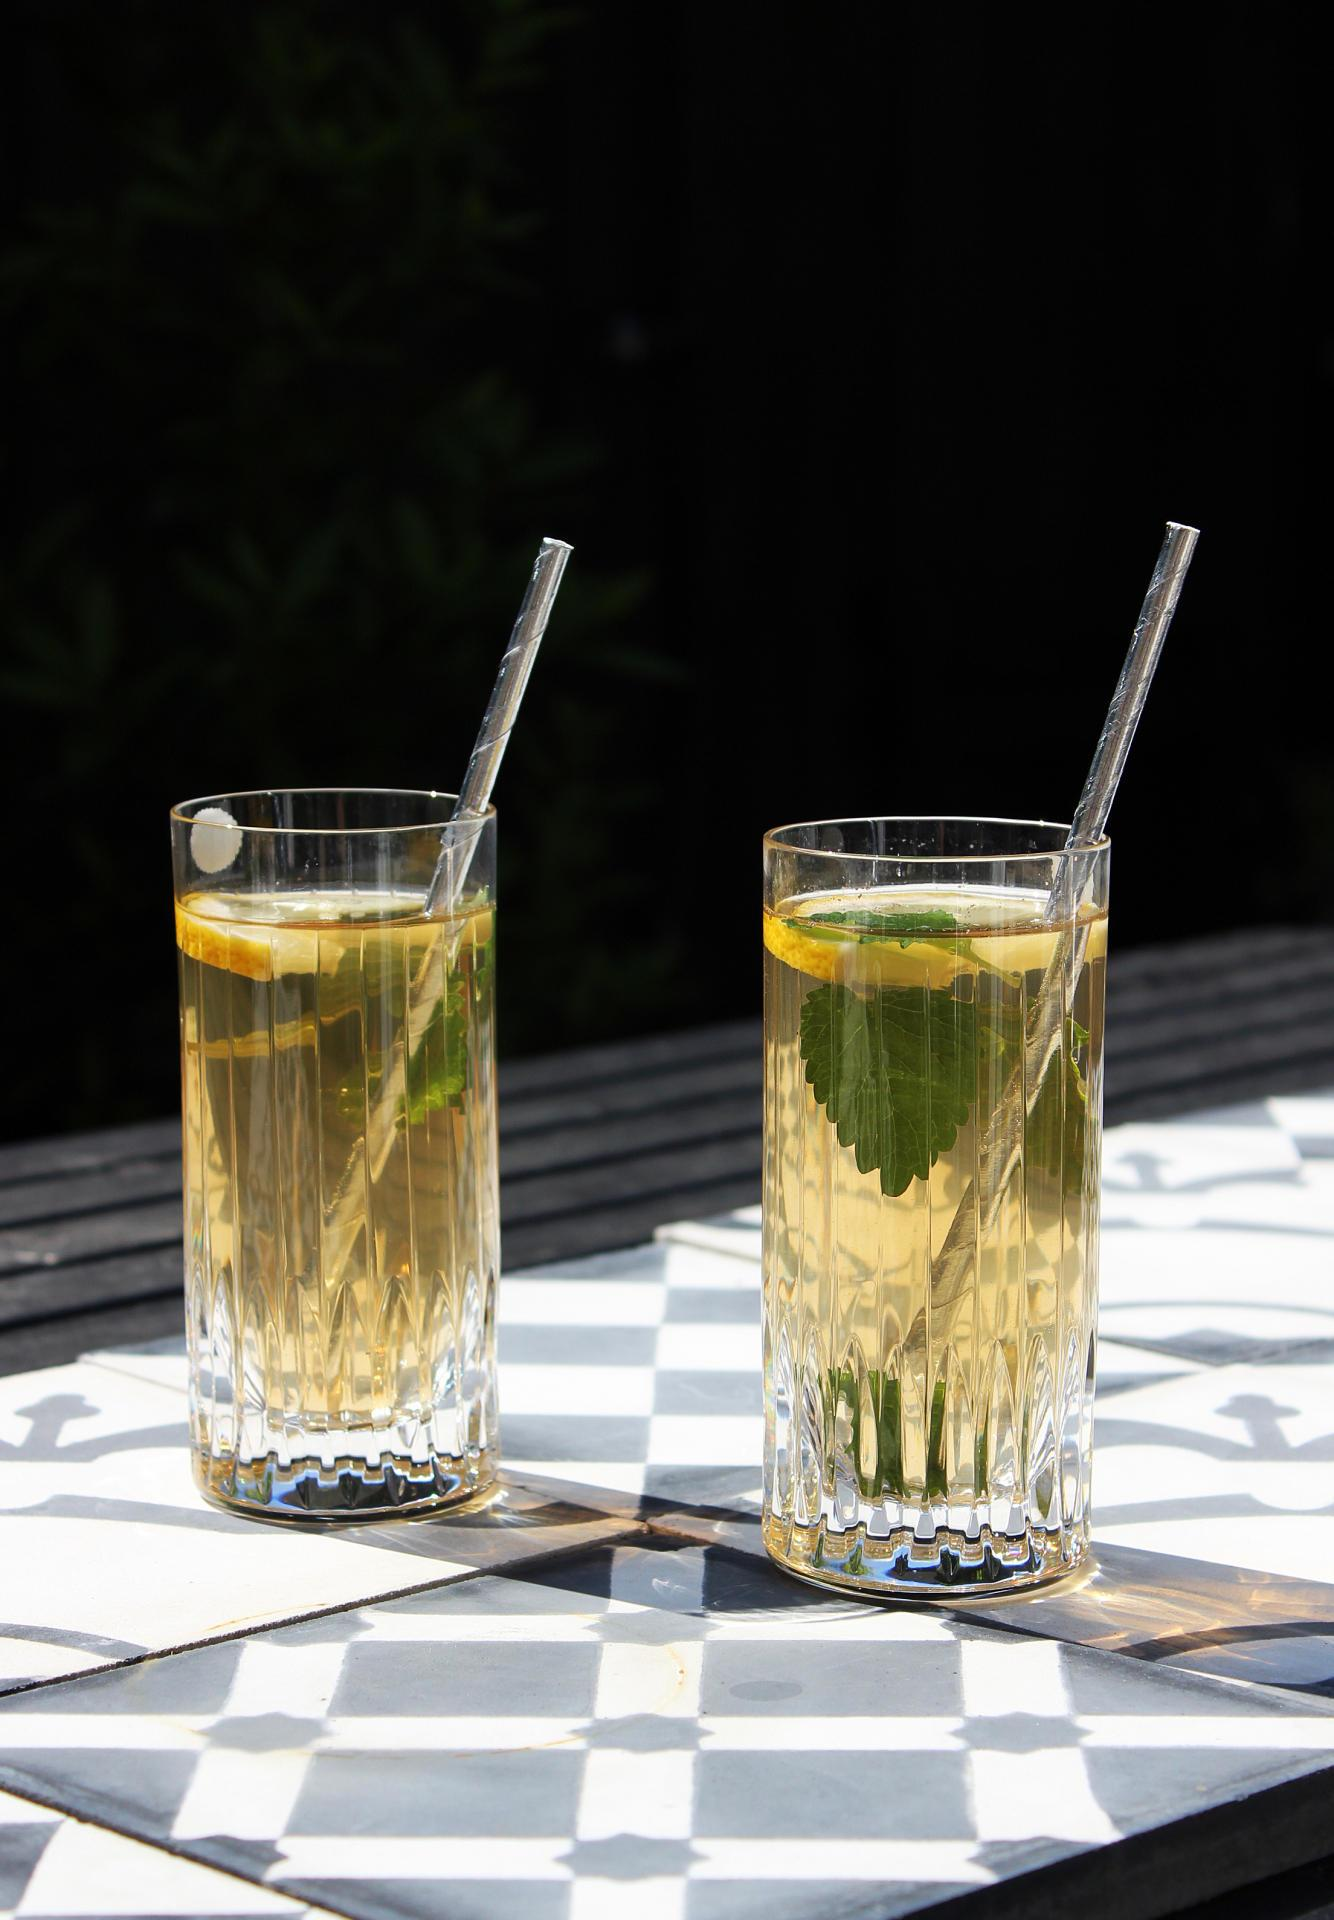 CRYSTAL BOHEMIA Křišťálová sklenice na longdrink Crystal BOHEMIA 3,3 dcl, čirá barva, sklo